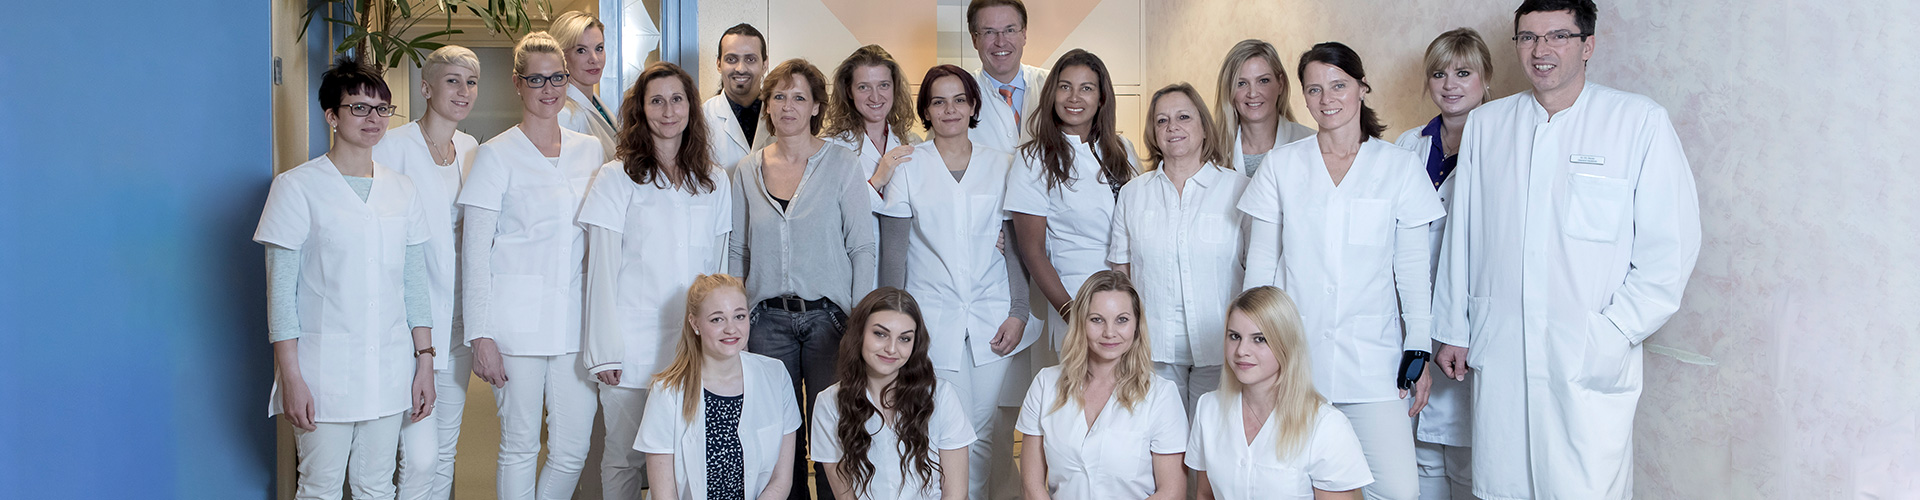 Banner Kontakt zu Hautarzt Hanau